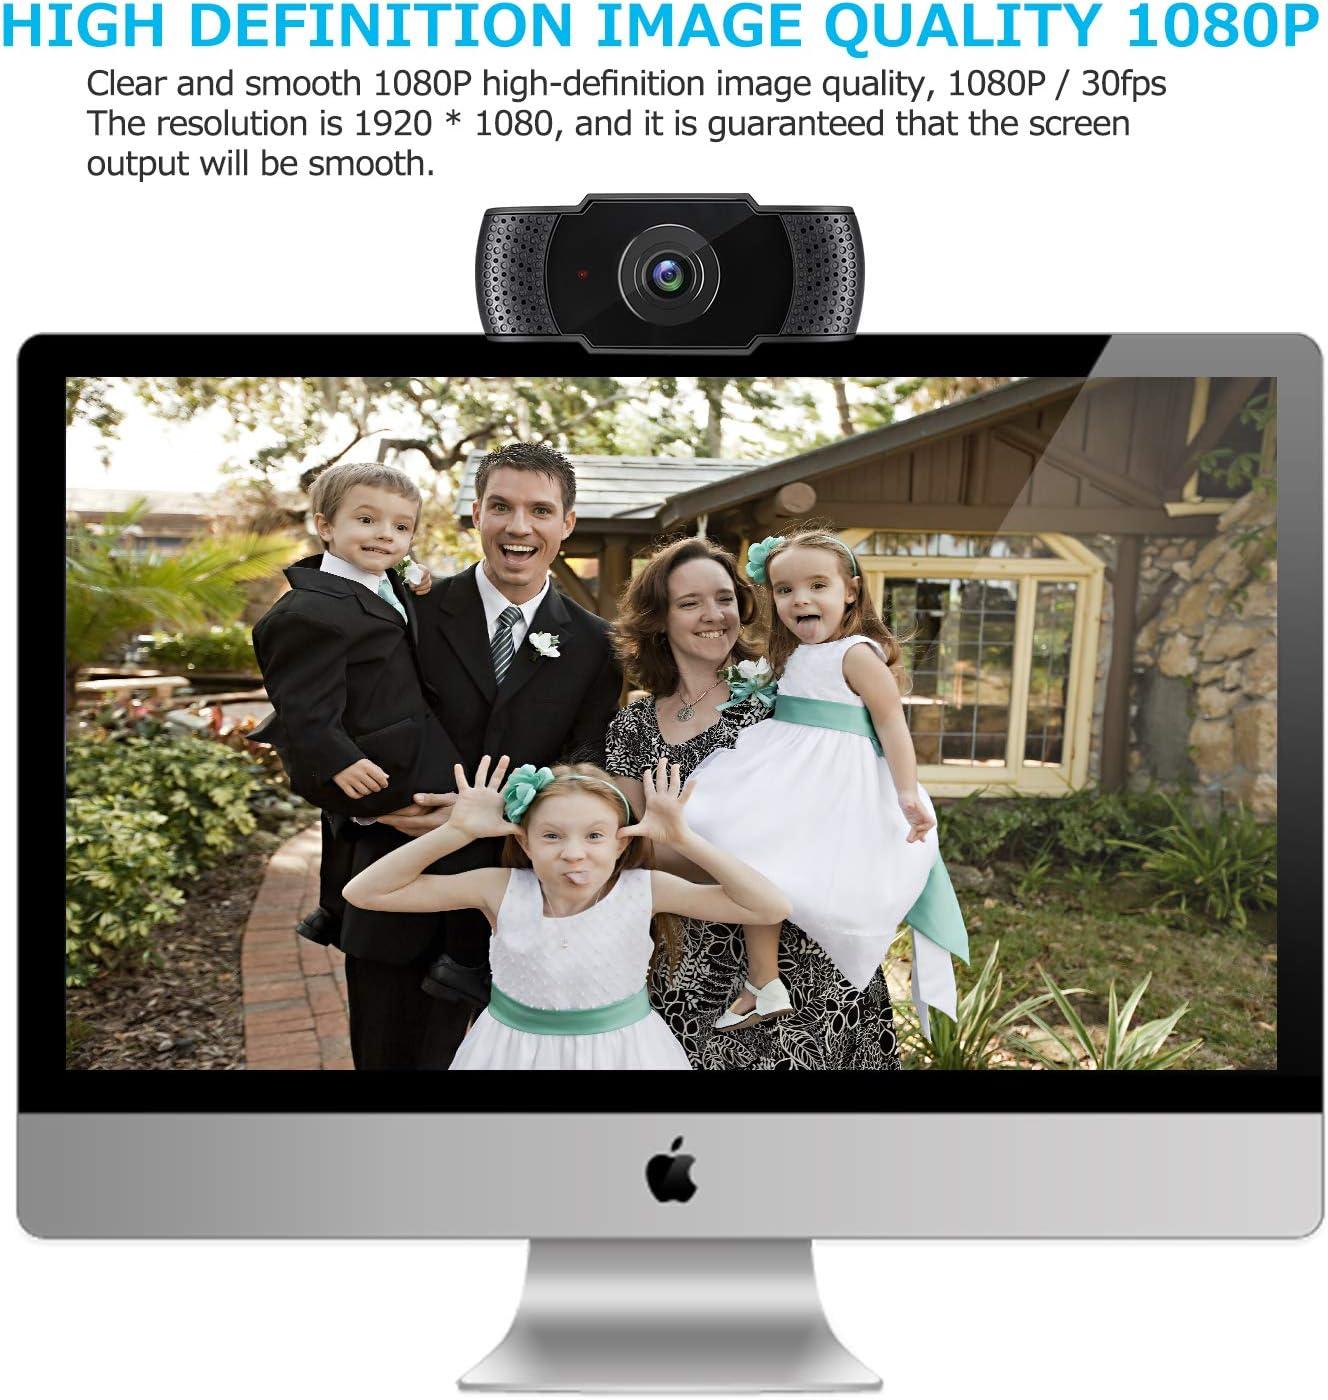 Gaming PC ideal f/ür Konferenzen Skype Videoanruf IVSO Webcam 1080P mit Mikrofon Plug /& Play f/ür Desktop PC,Laptop Live /Übertragungen WebEx-Schwarz PC Laptop Desktop USB 2.0 Full HD Webkamera